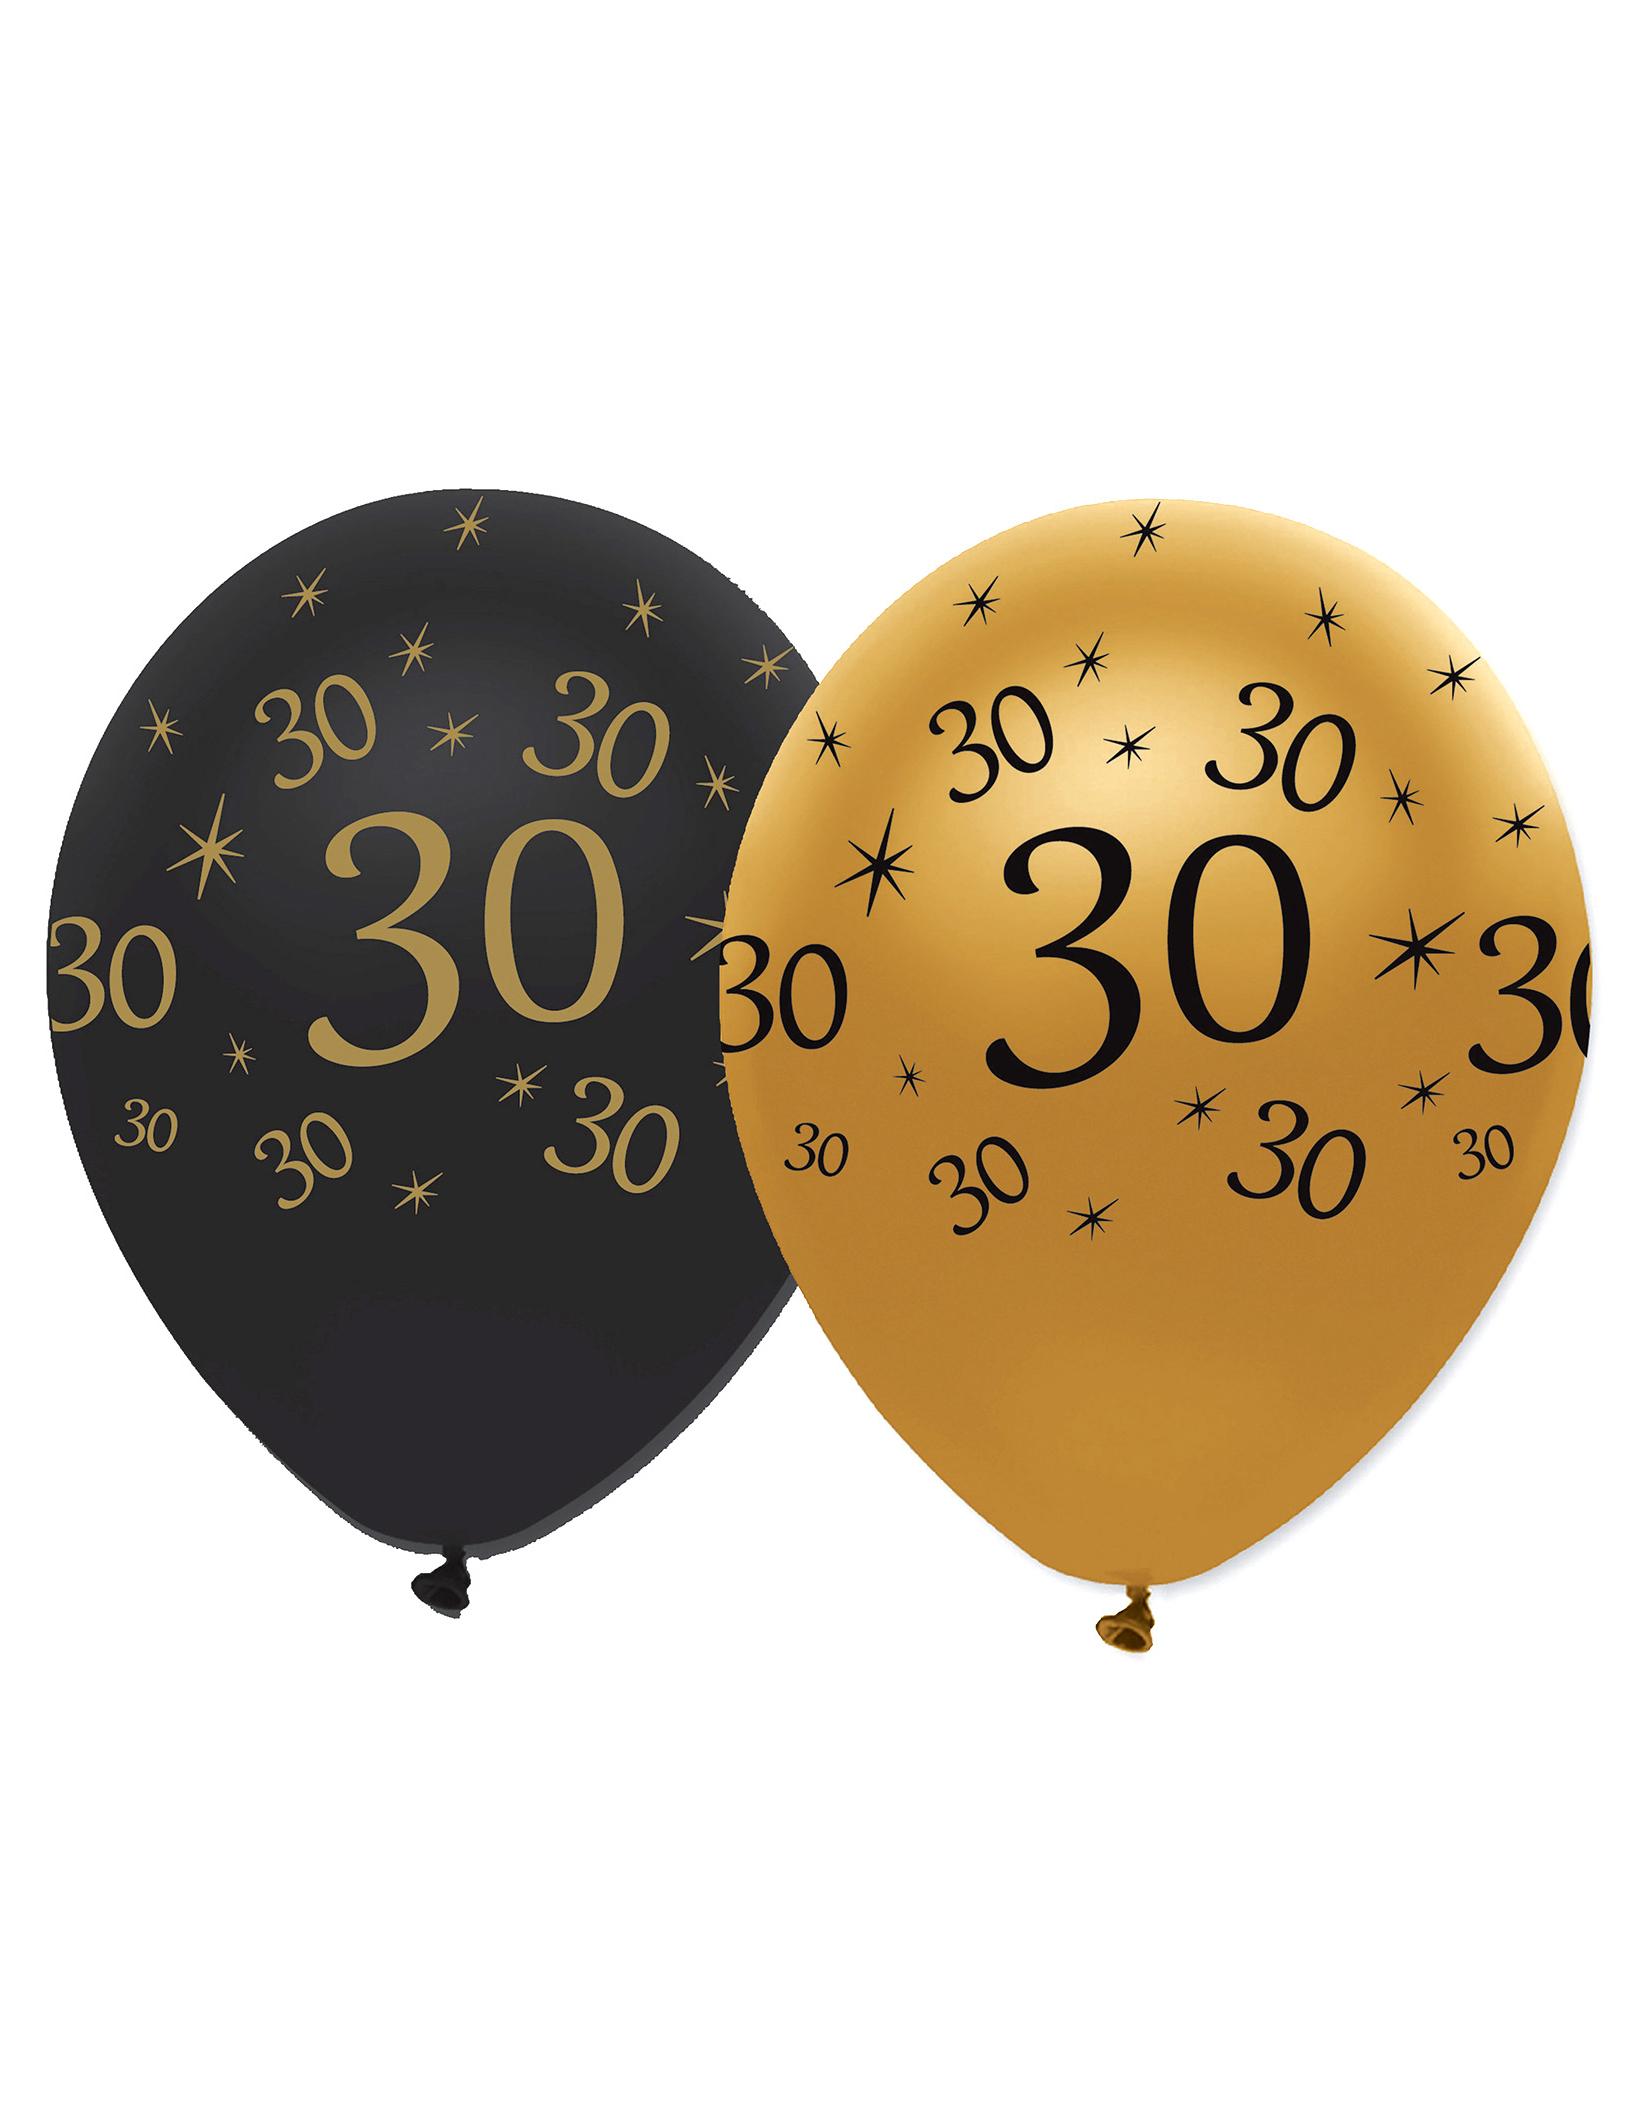 6 luftballons 30 geburtstag partydeko und g nstige faschingskost me vegaoo. Black Bedroom Furniture Sets. Home Design Ideas